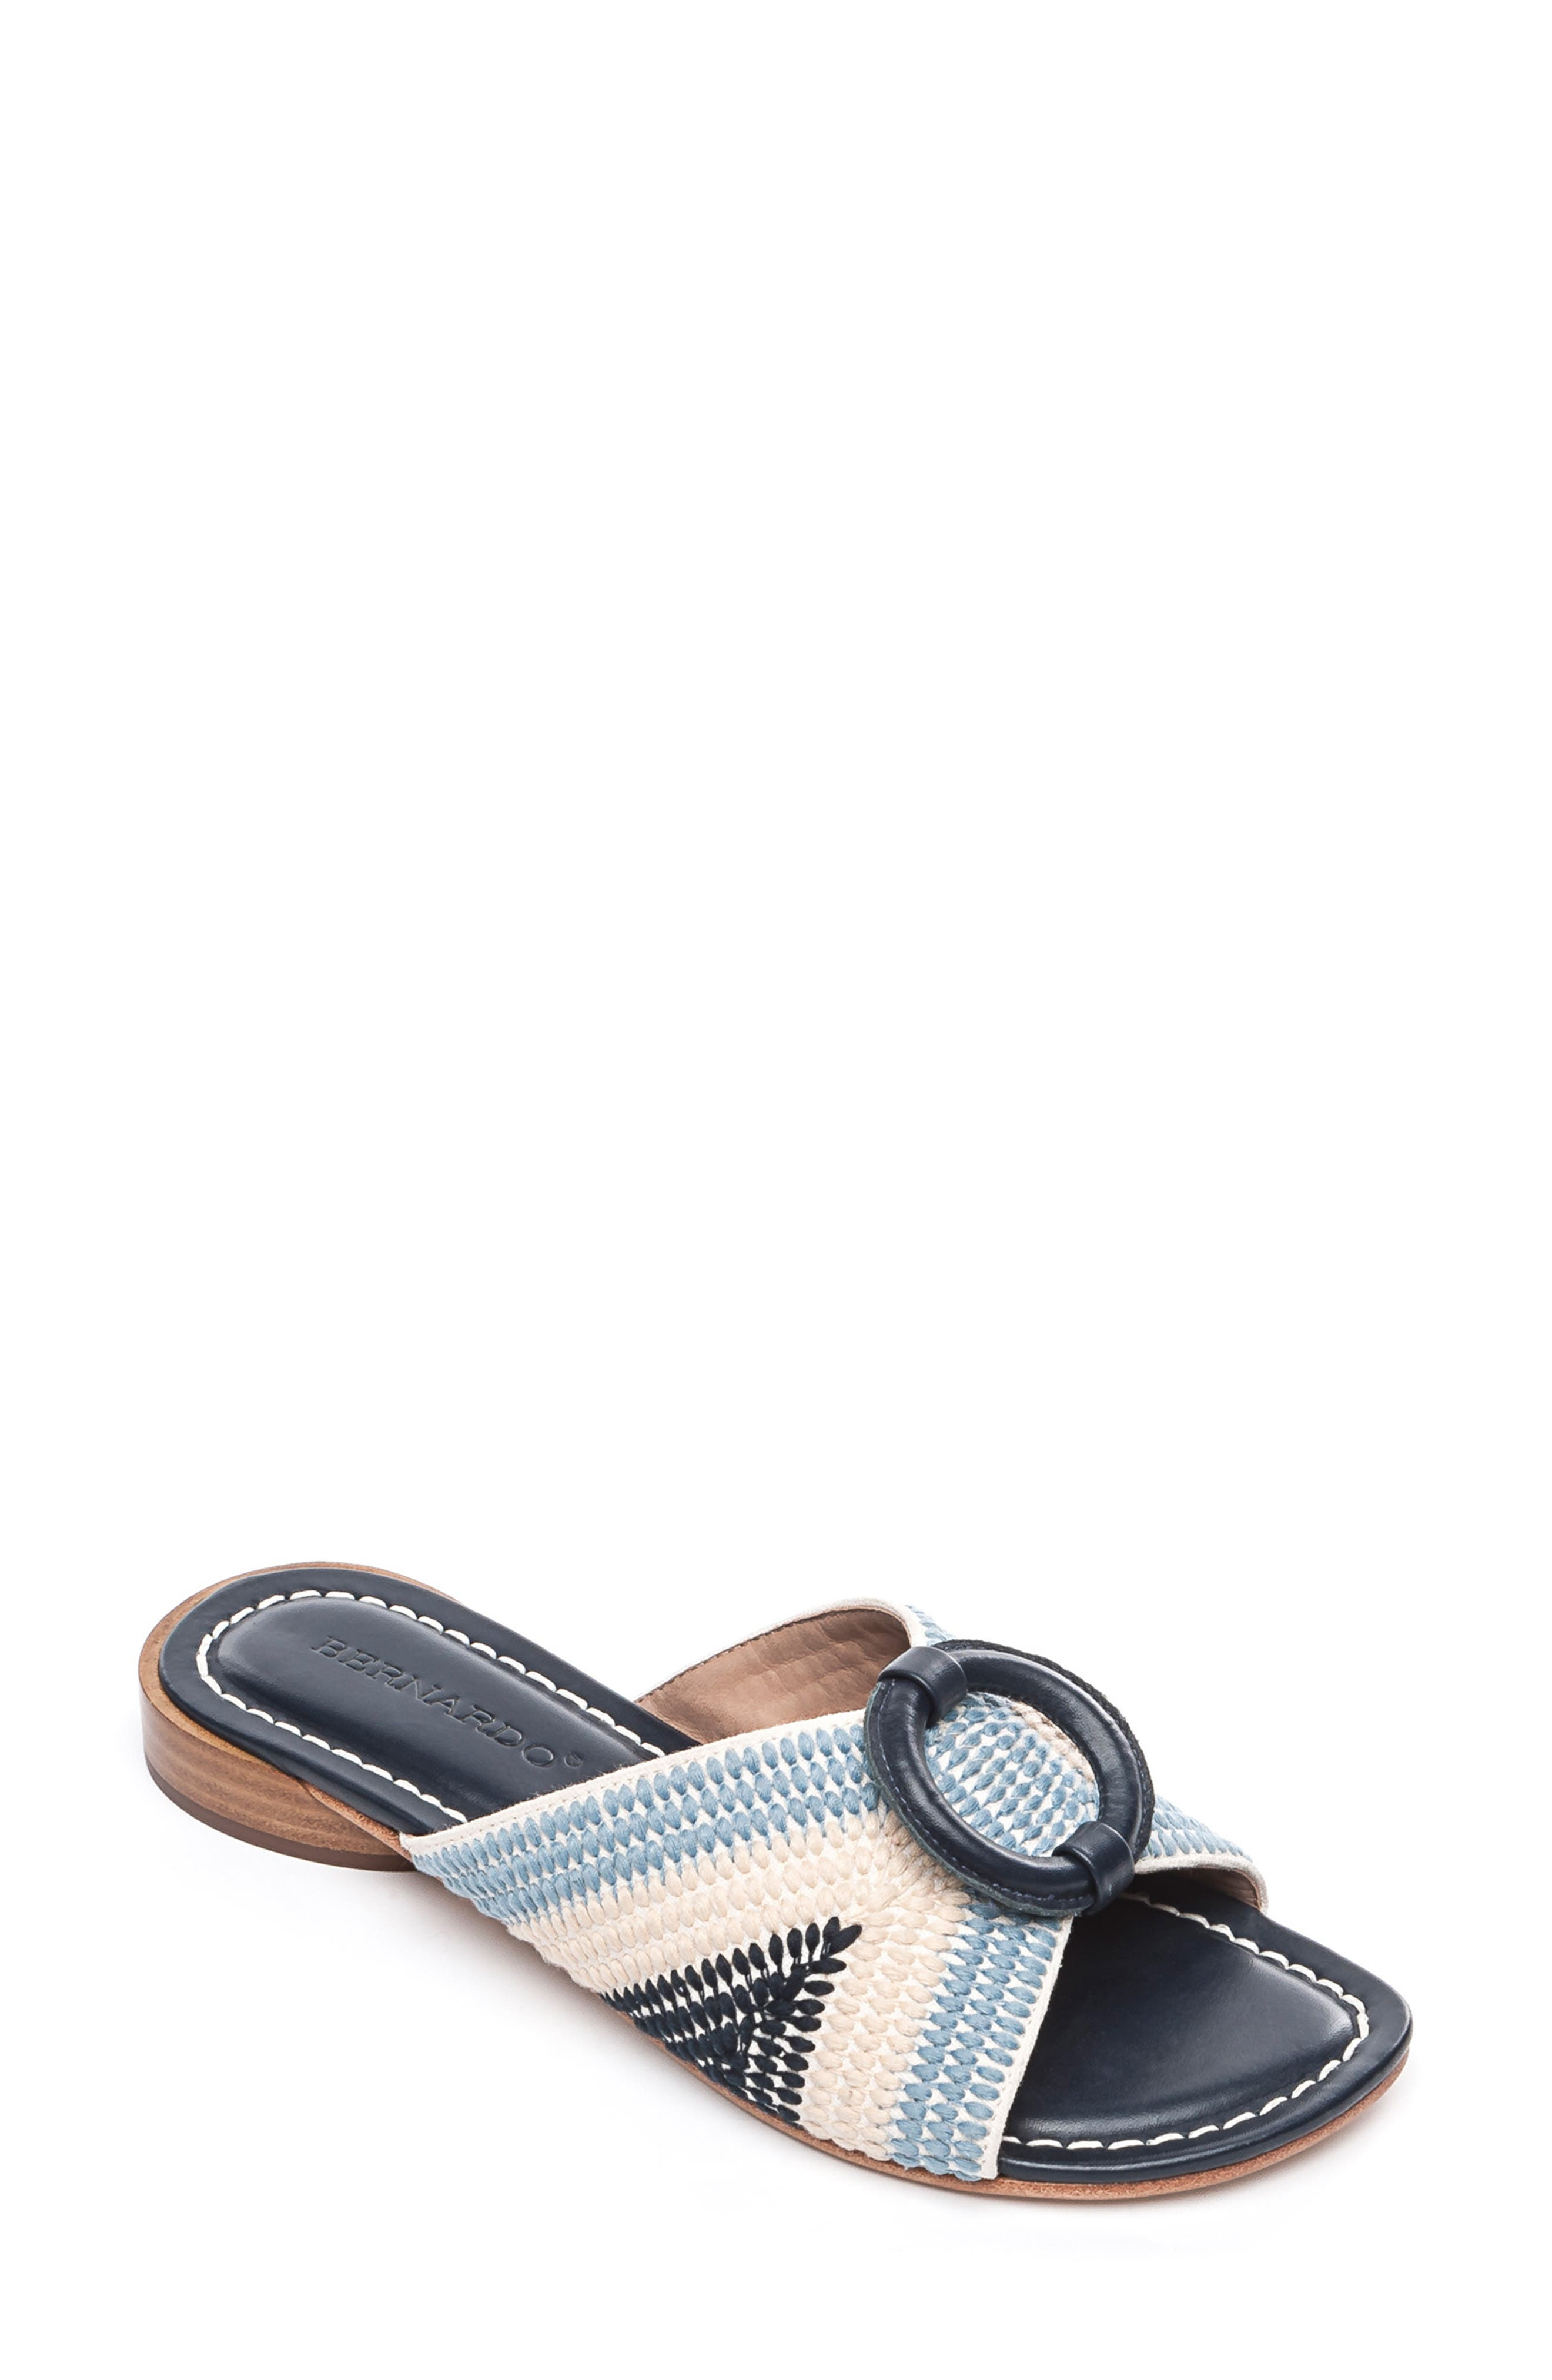 BERNARDO, Footwear Tay Slide Sandal, Main thumbnail 1, color, BLUE/ CREAM LEATHER